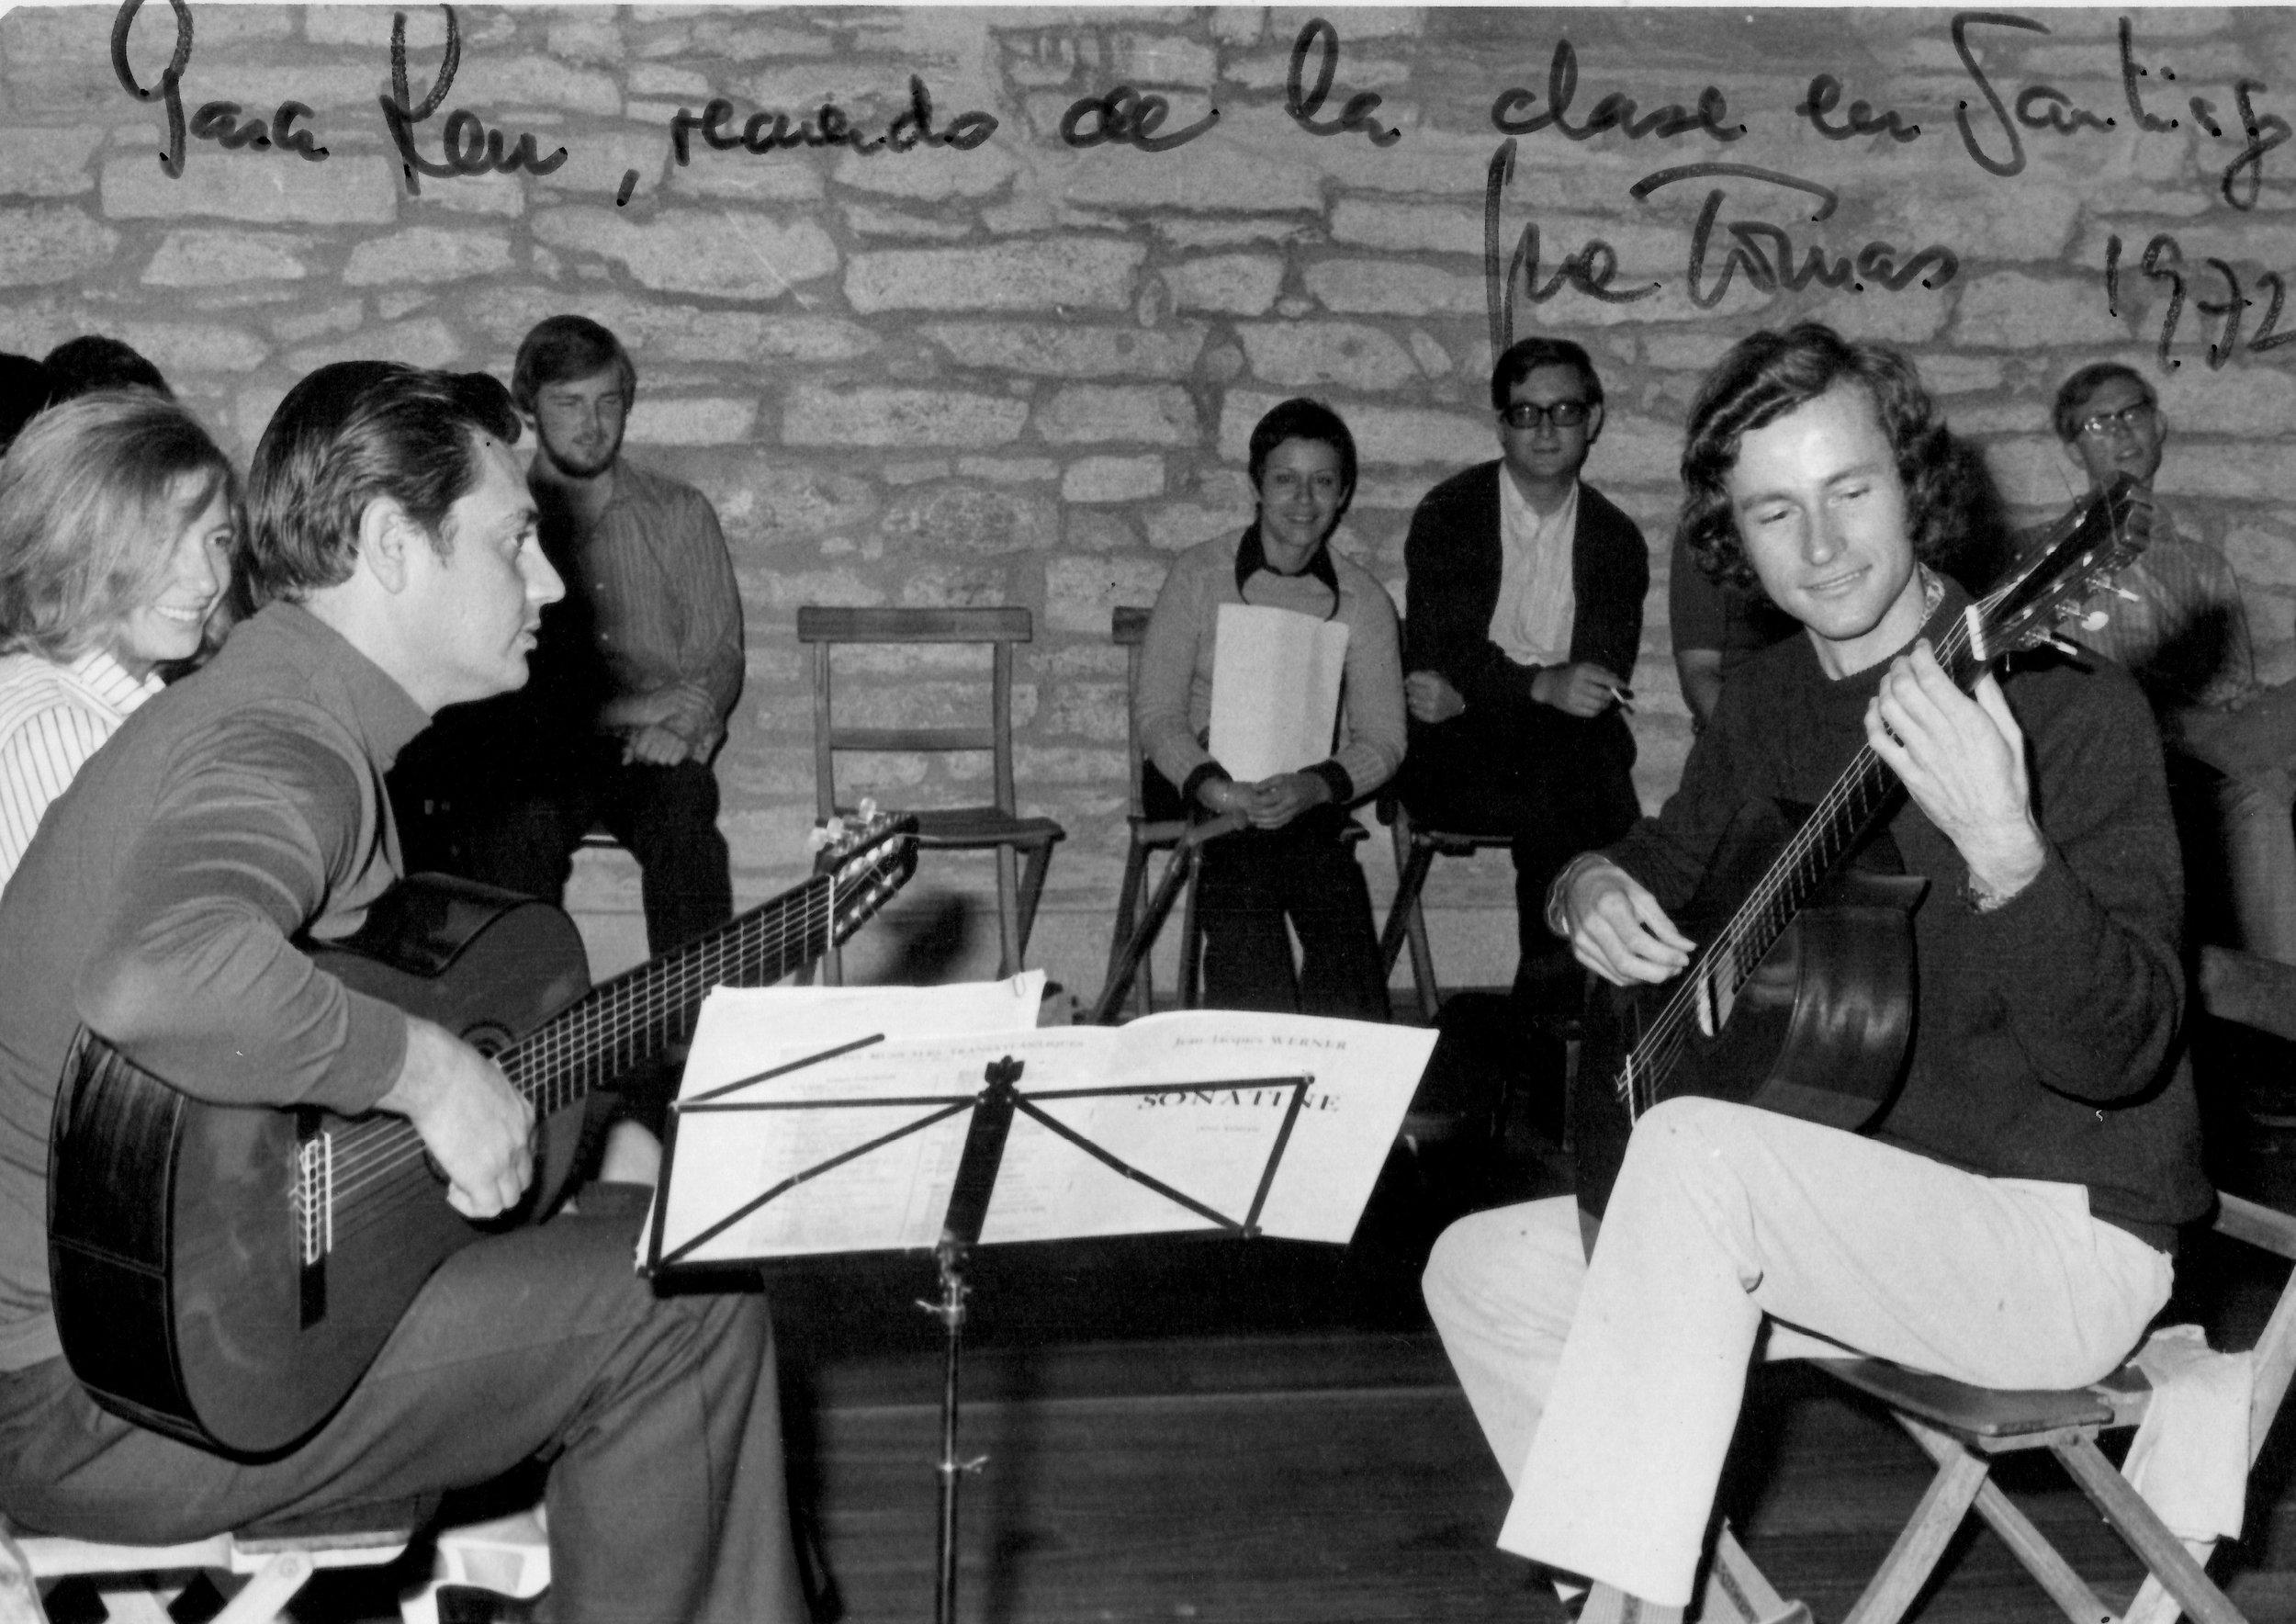 Ken Burns at the 1972 Andre Segovia Summer School in Santiago de Compostela (Jose Tomas - left, Ken Burns - right)